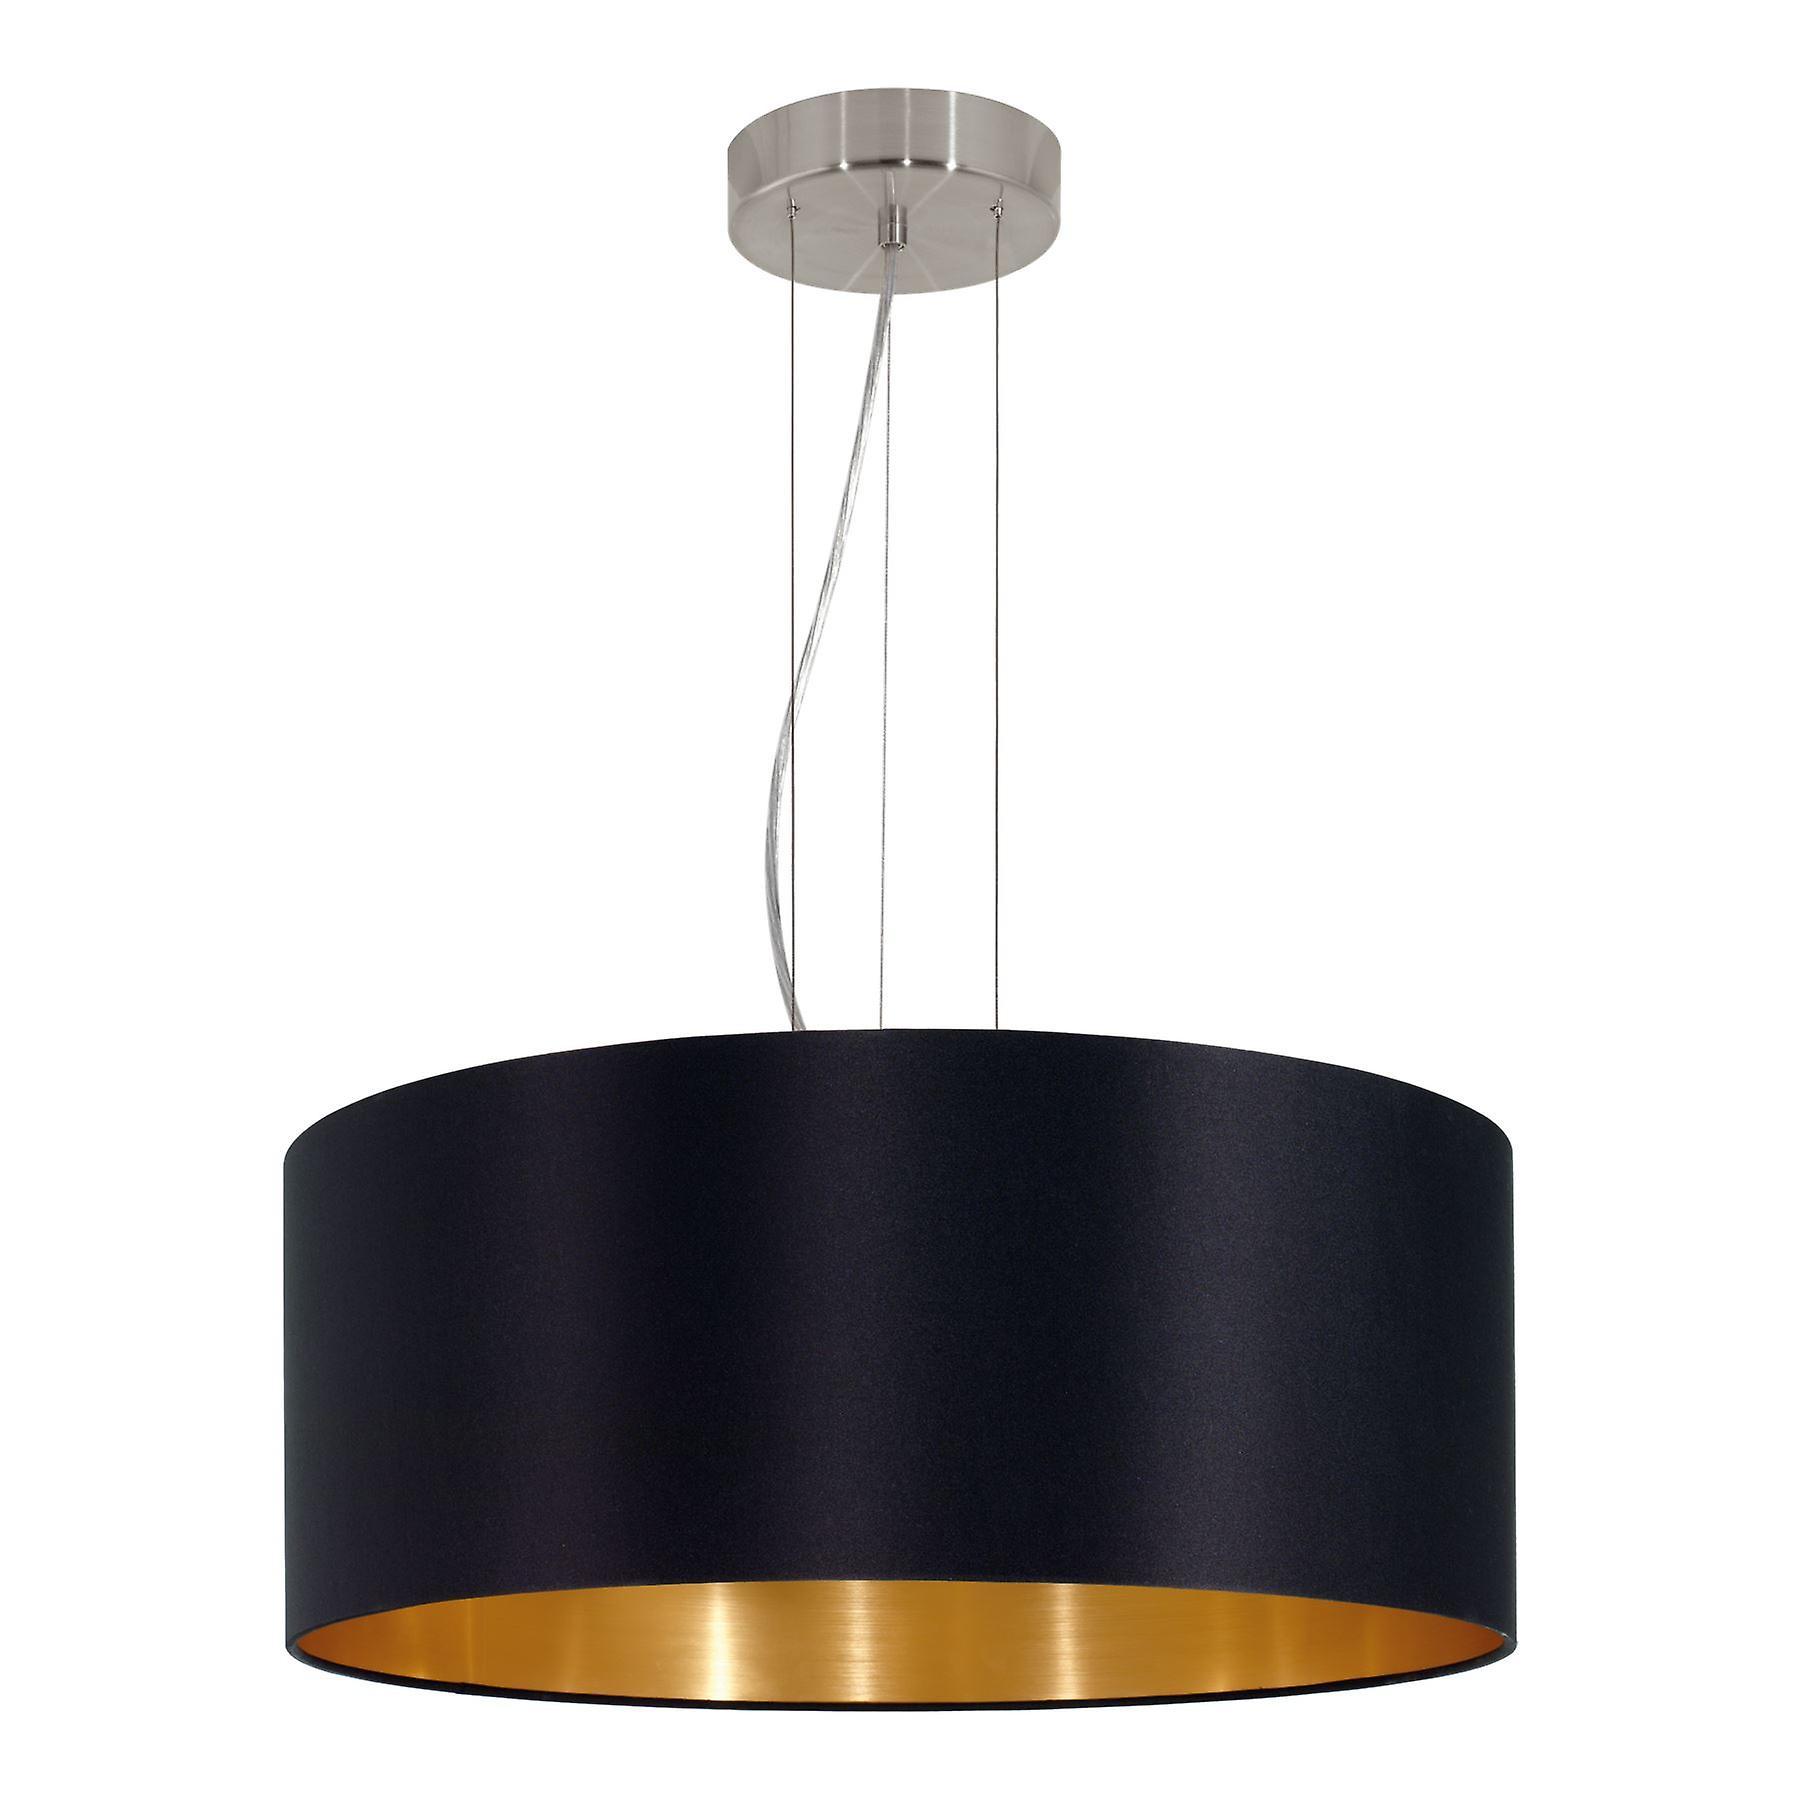 Eglo - Maserlo 3 lumière pendentif Ceiling lumière Satin Nickel noir EG31605